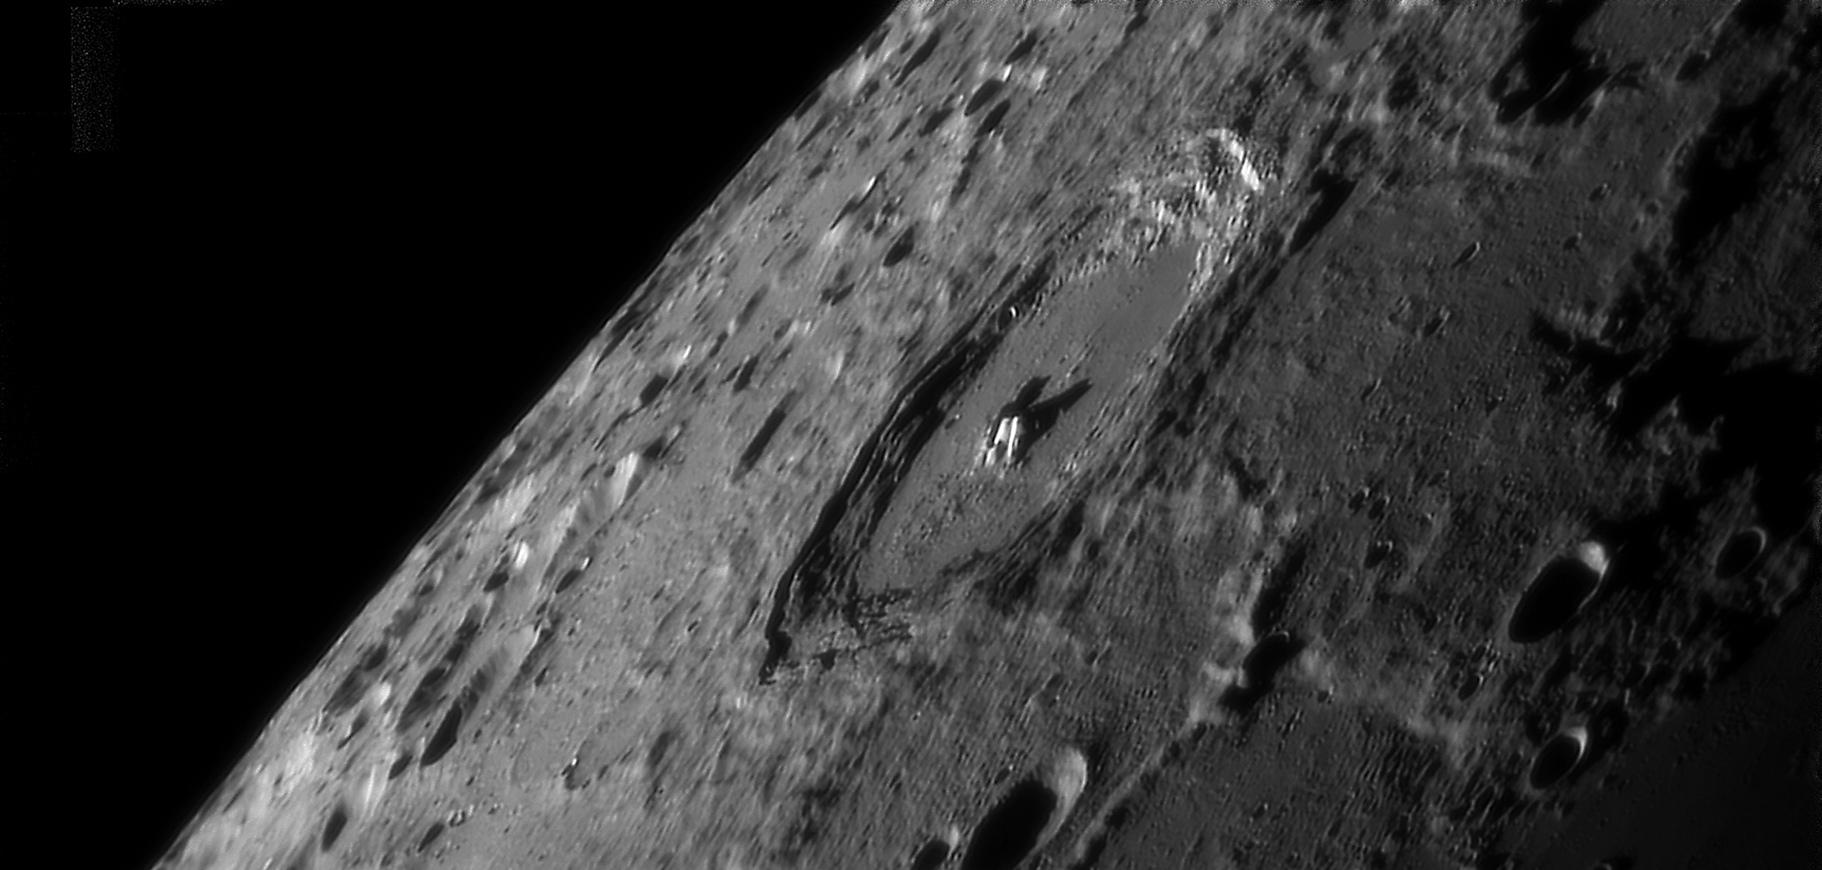 large.moon_26_08_2019_Pytagore_Re.jpg.879d75bee3b66b60a66ea03499c89bc1.jpg